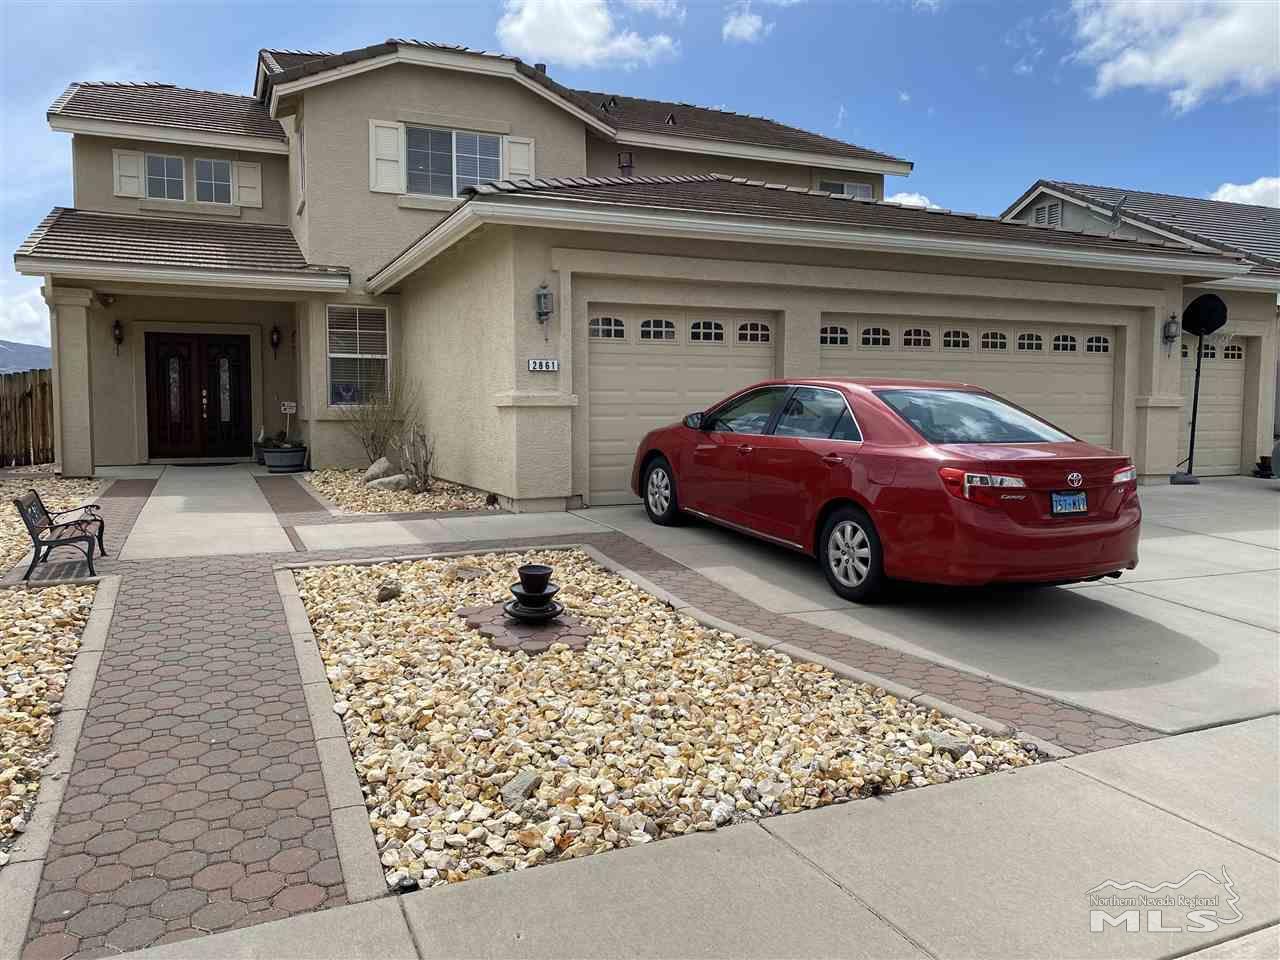 Image for 2861 Sunline, Reno, NV 89523-2140